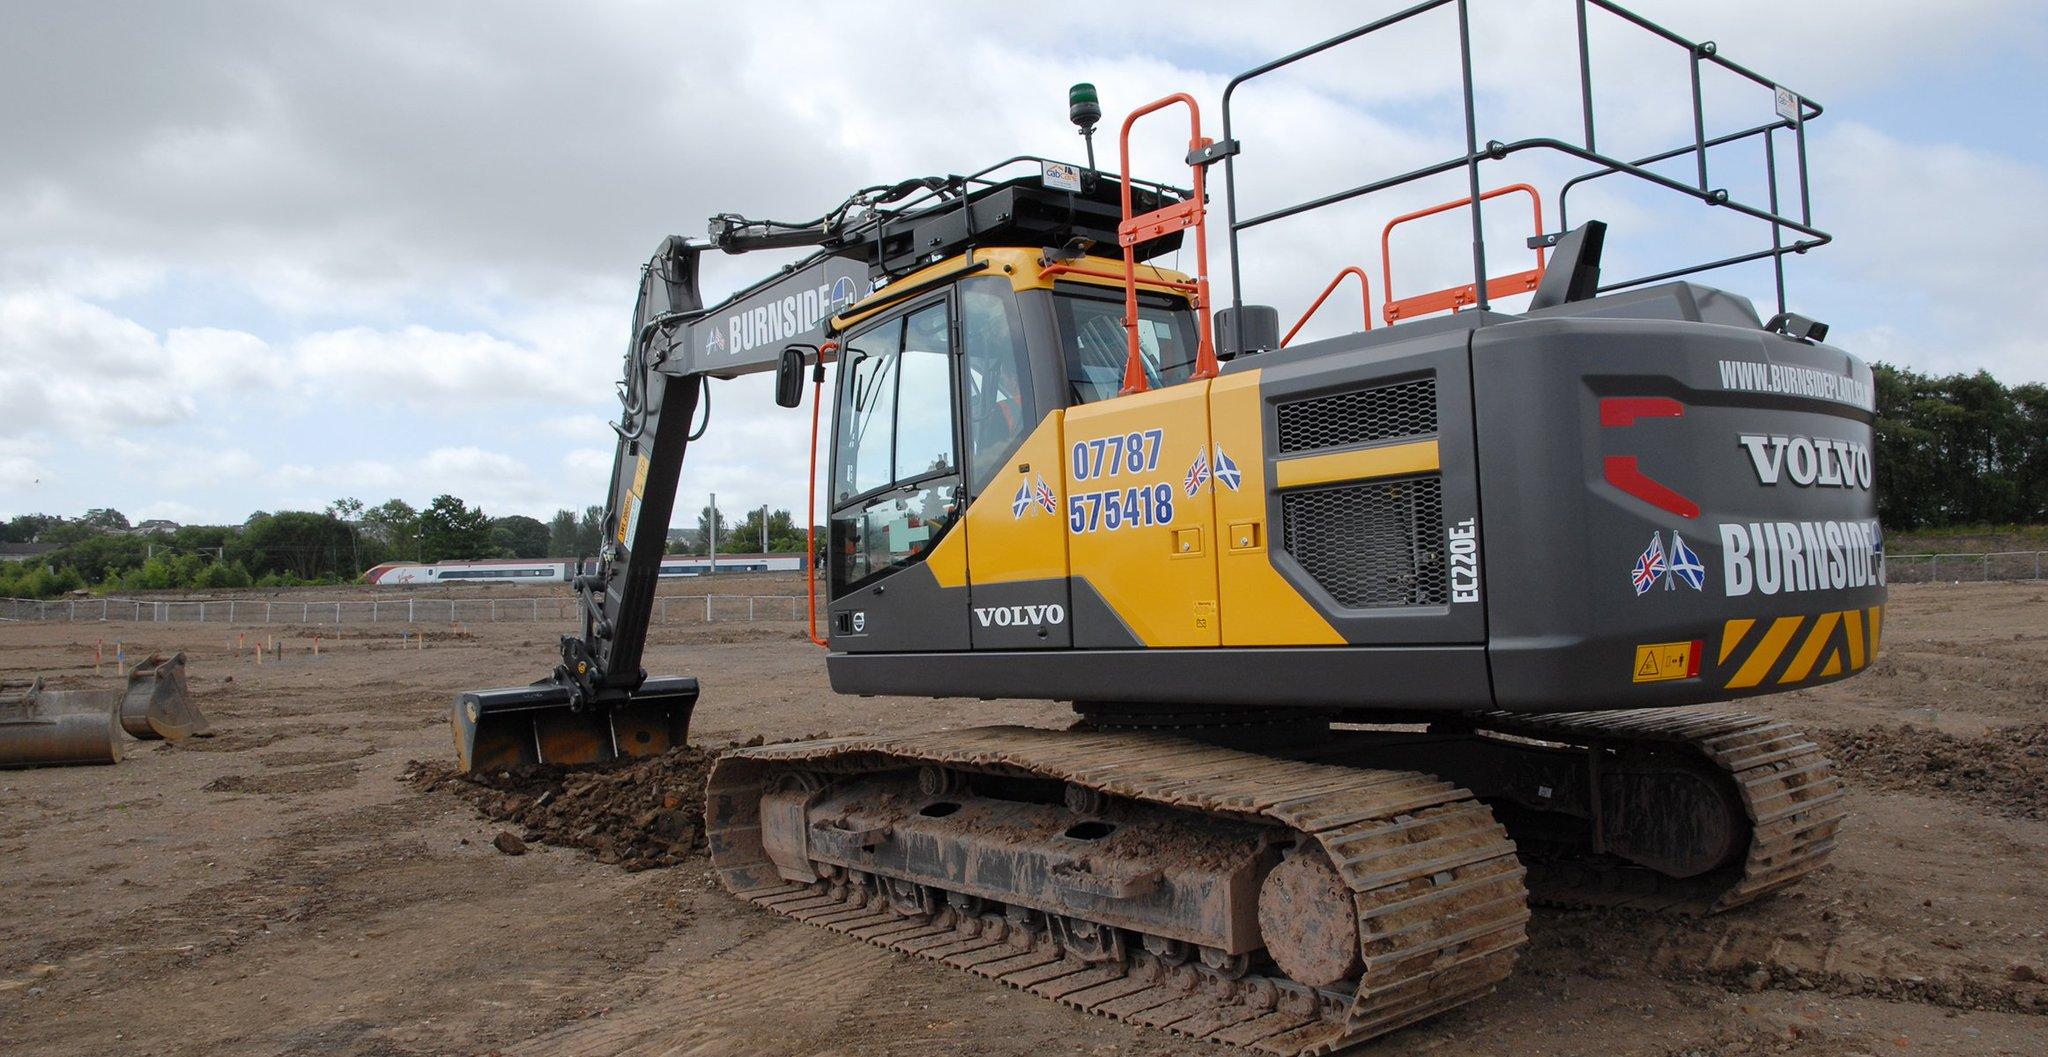 escavatore cingolato EC480EL DKVc_ZzW4AEISWK